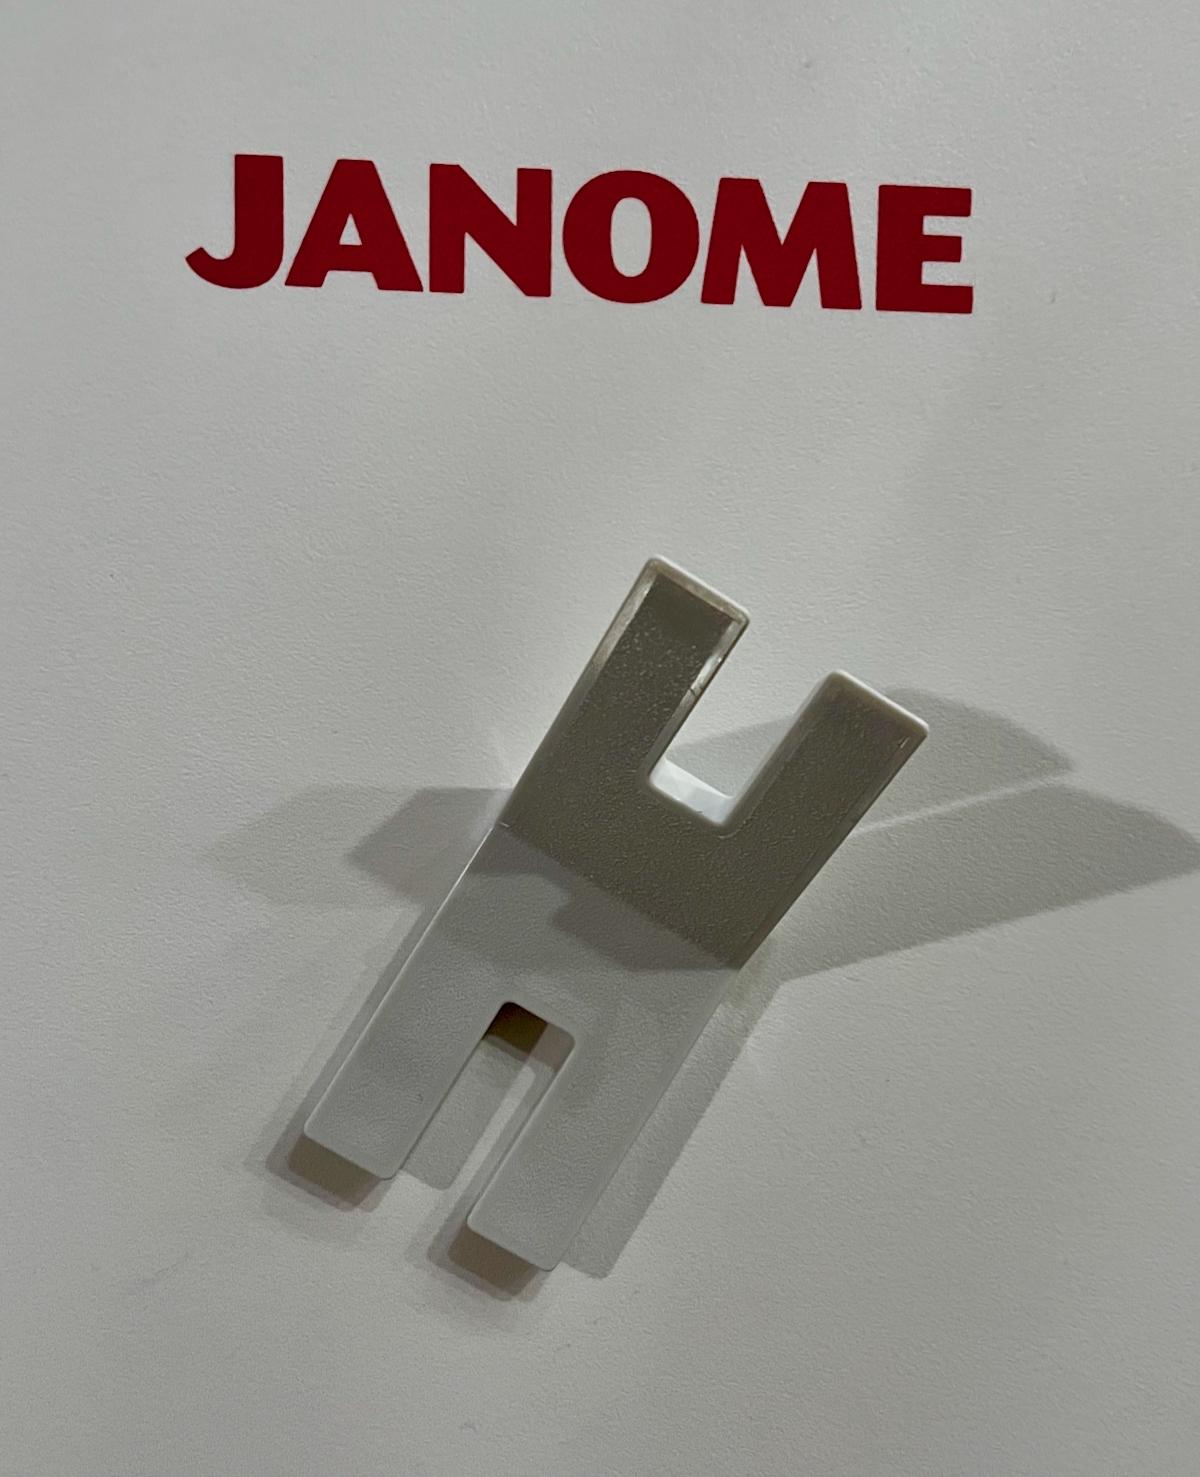 Janome button shank accessory - 1